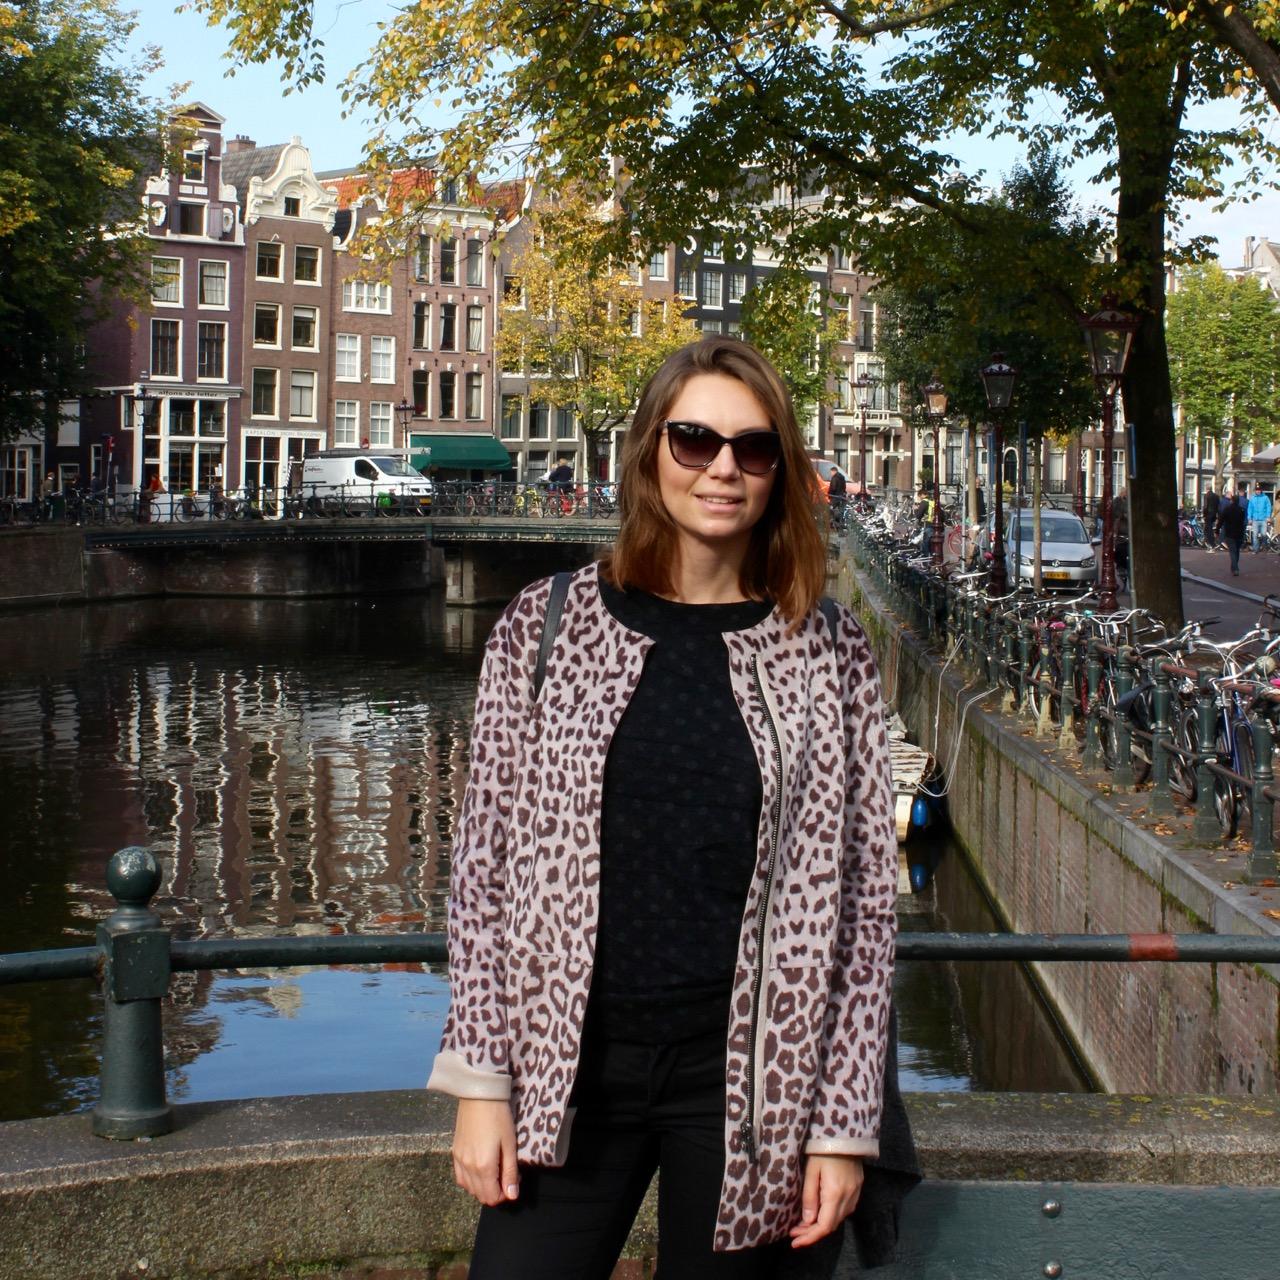 Amsterdam, Netherlands - 7